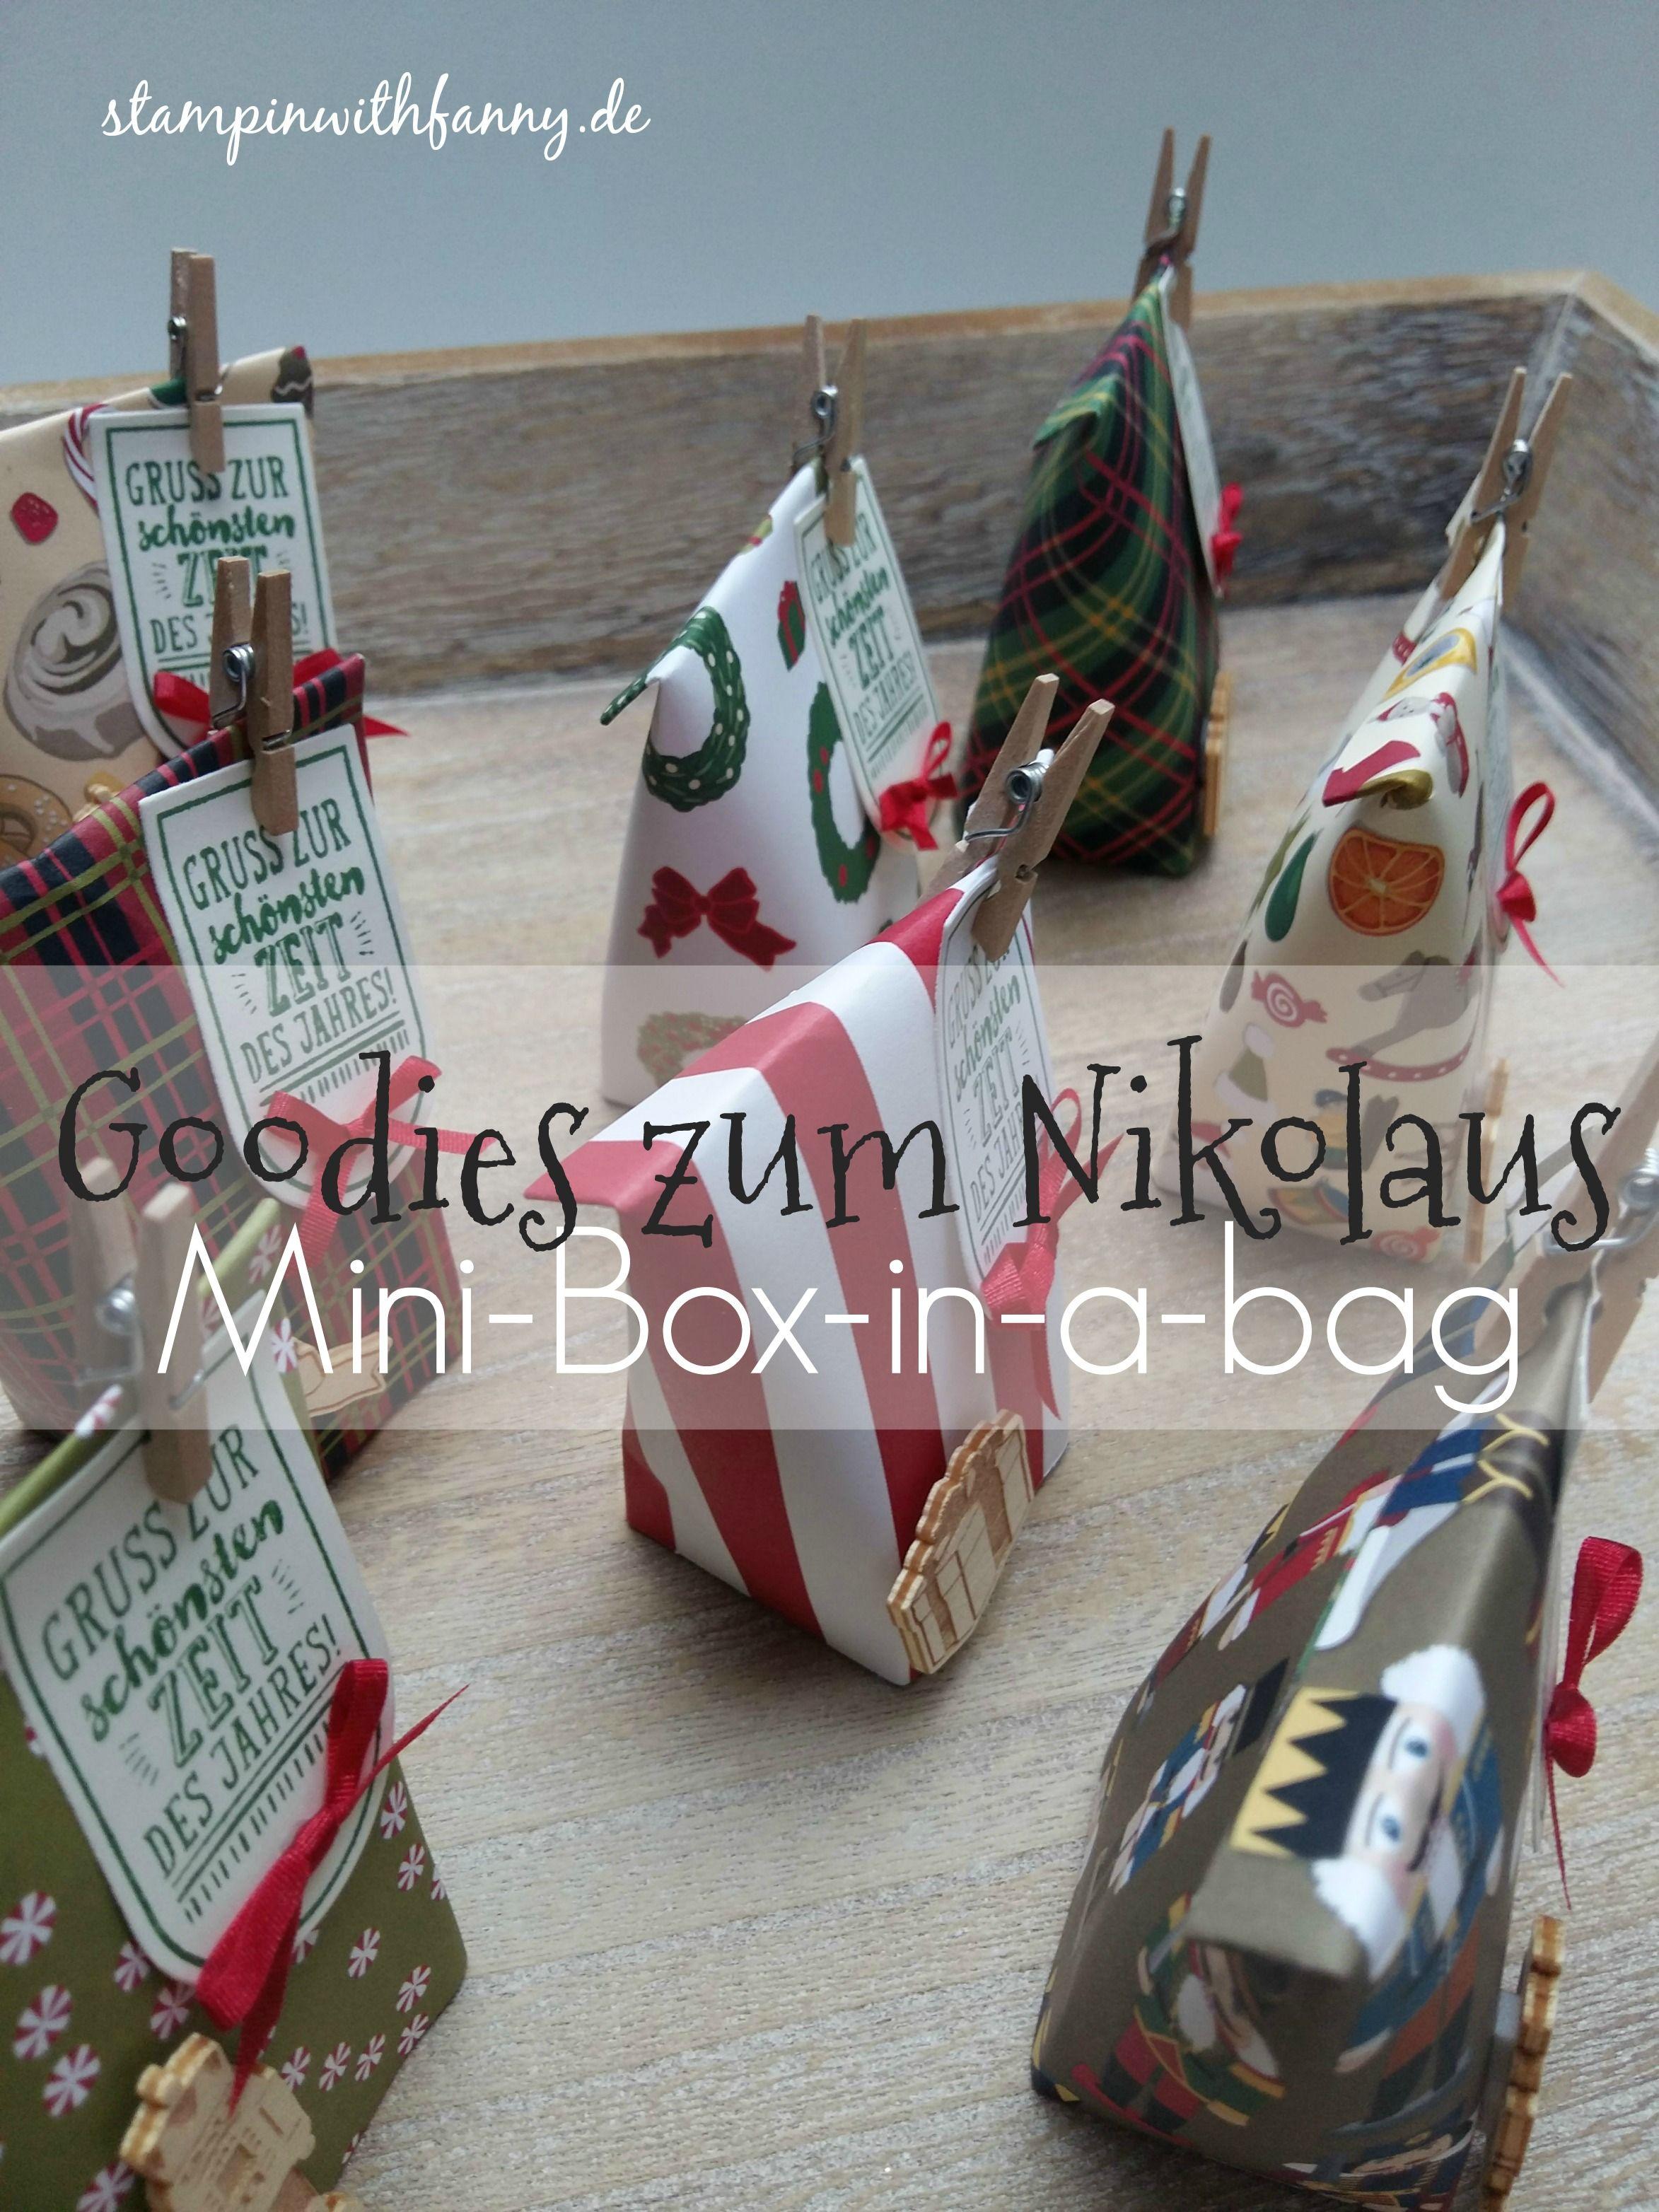 satmpinwithfanny stampin up weihnachten ANLEITUNG christmas goo s